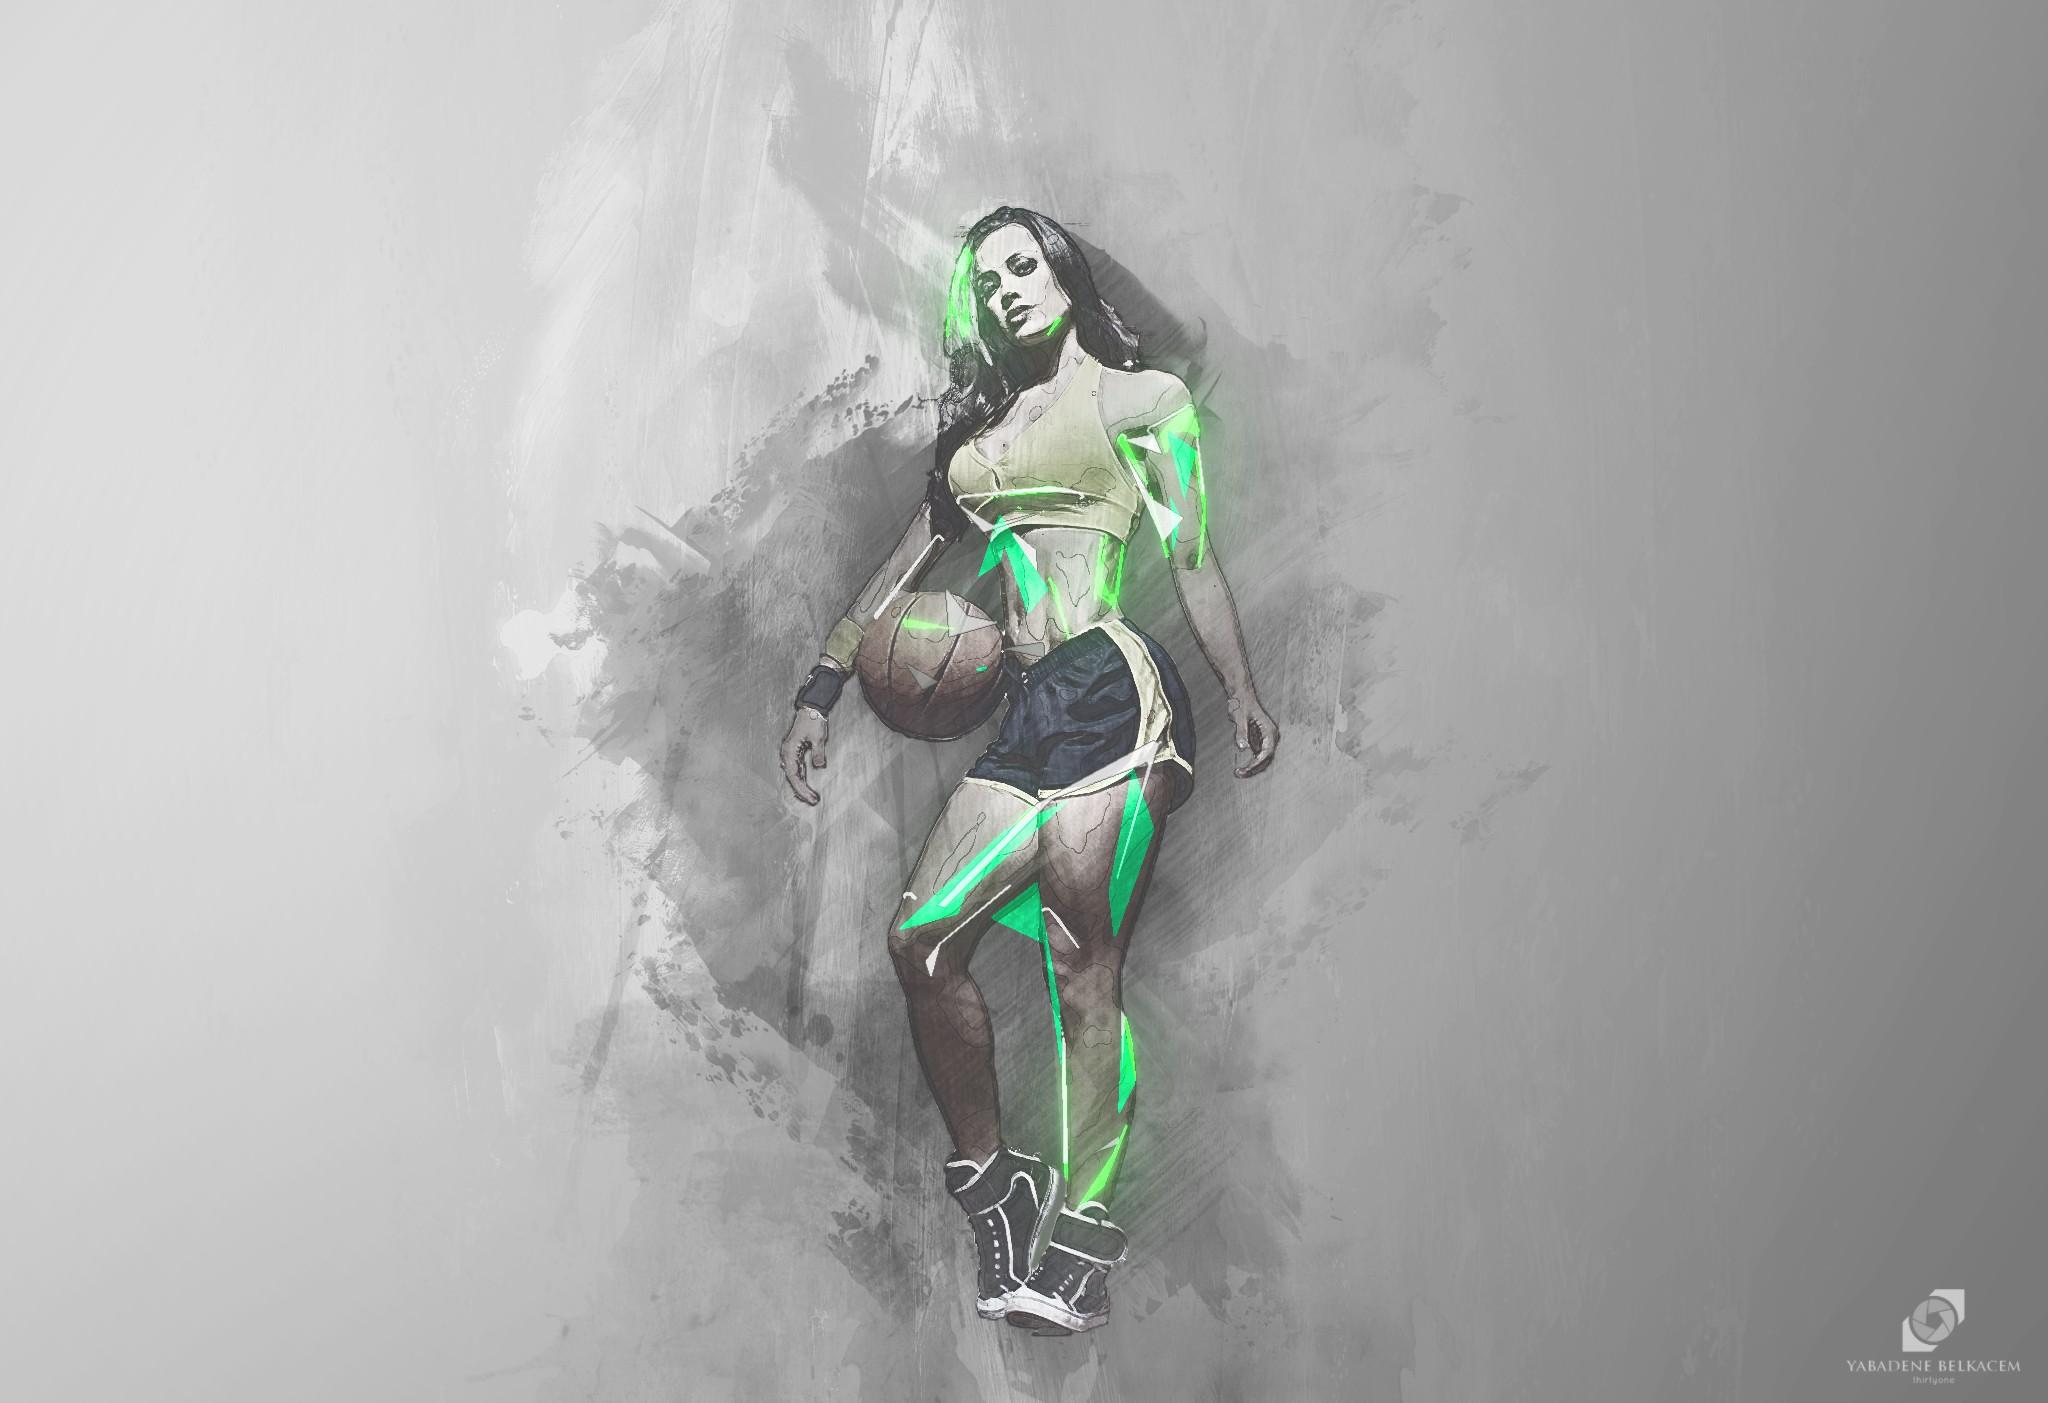 Wallpaper Drawing Illustration Women Sport Abstract Artwork